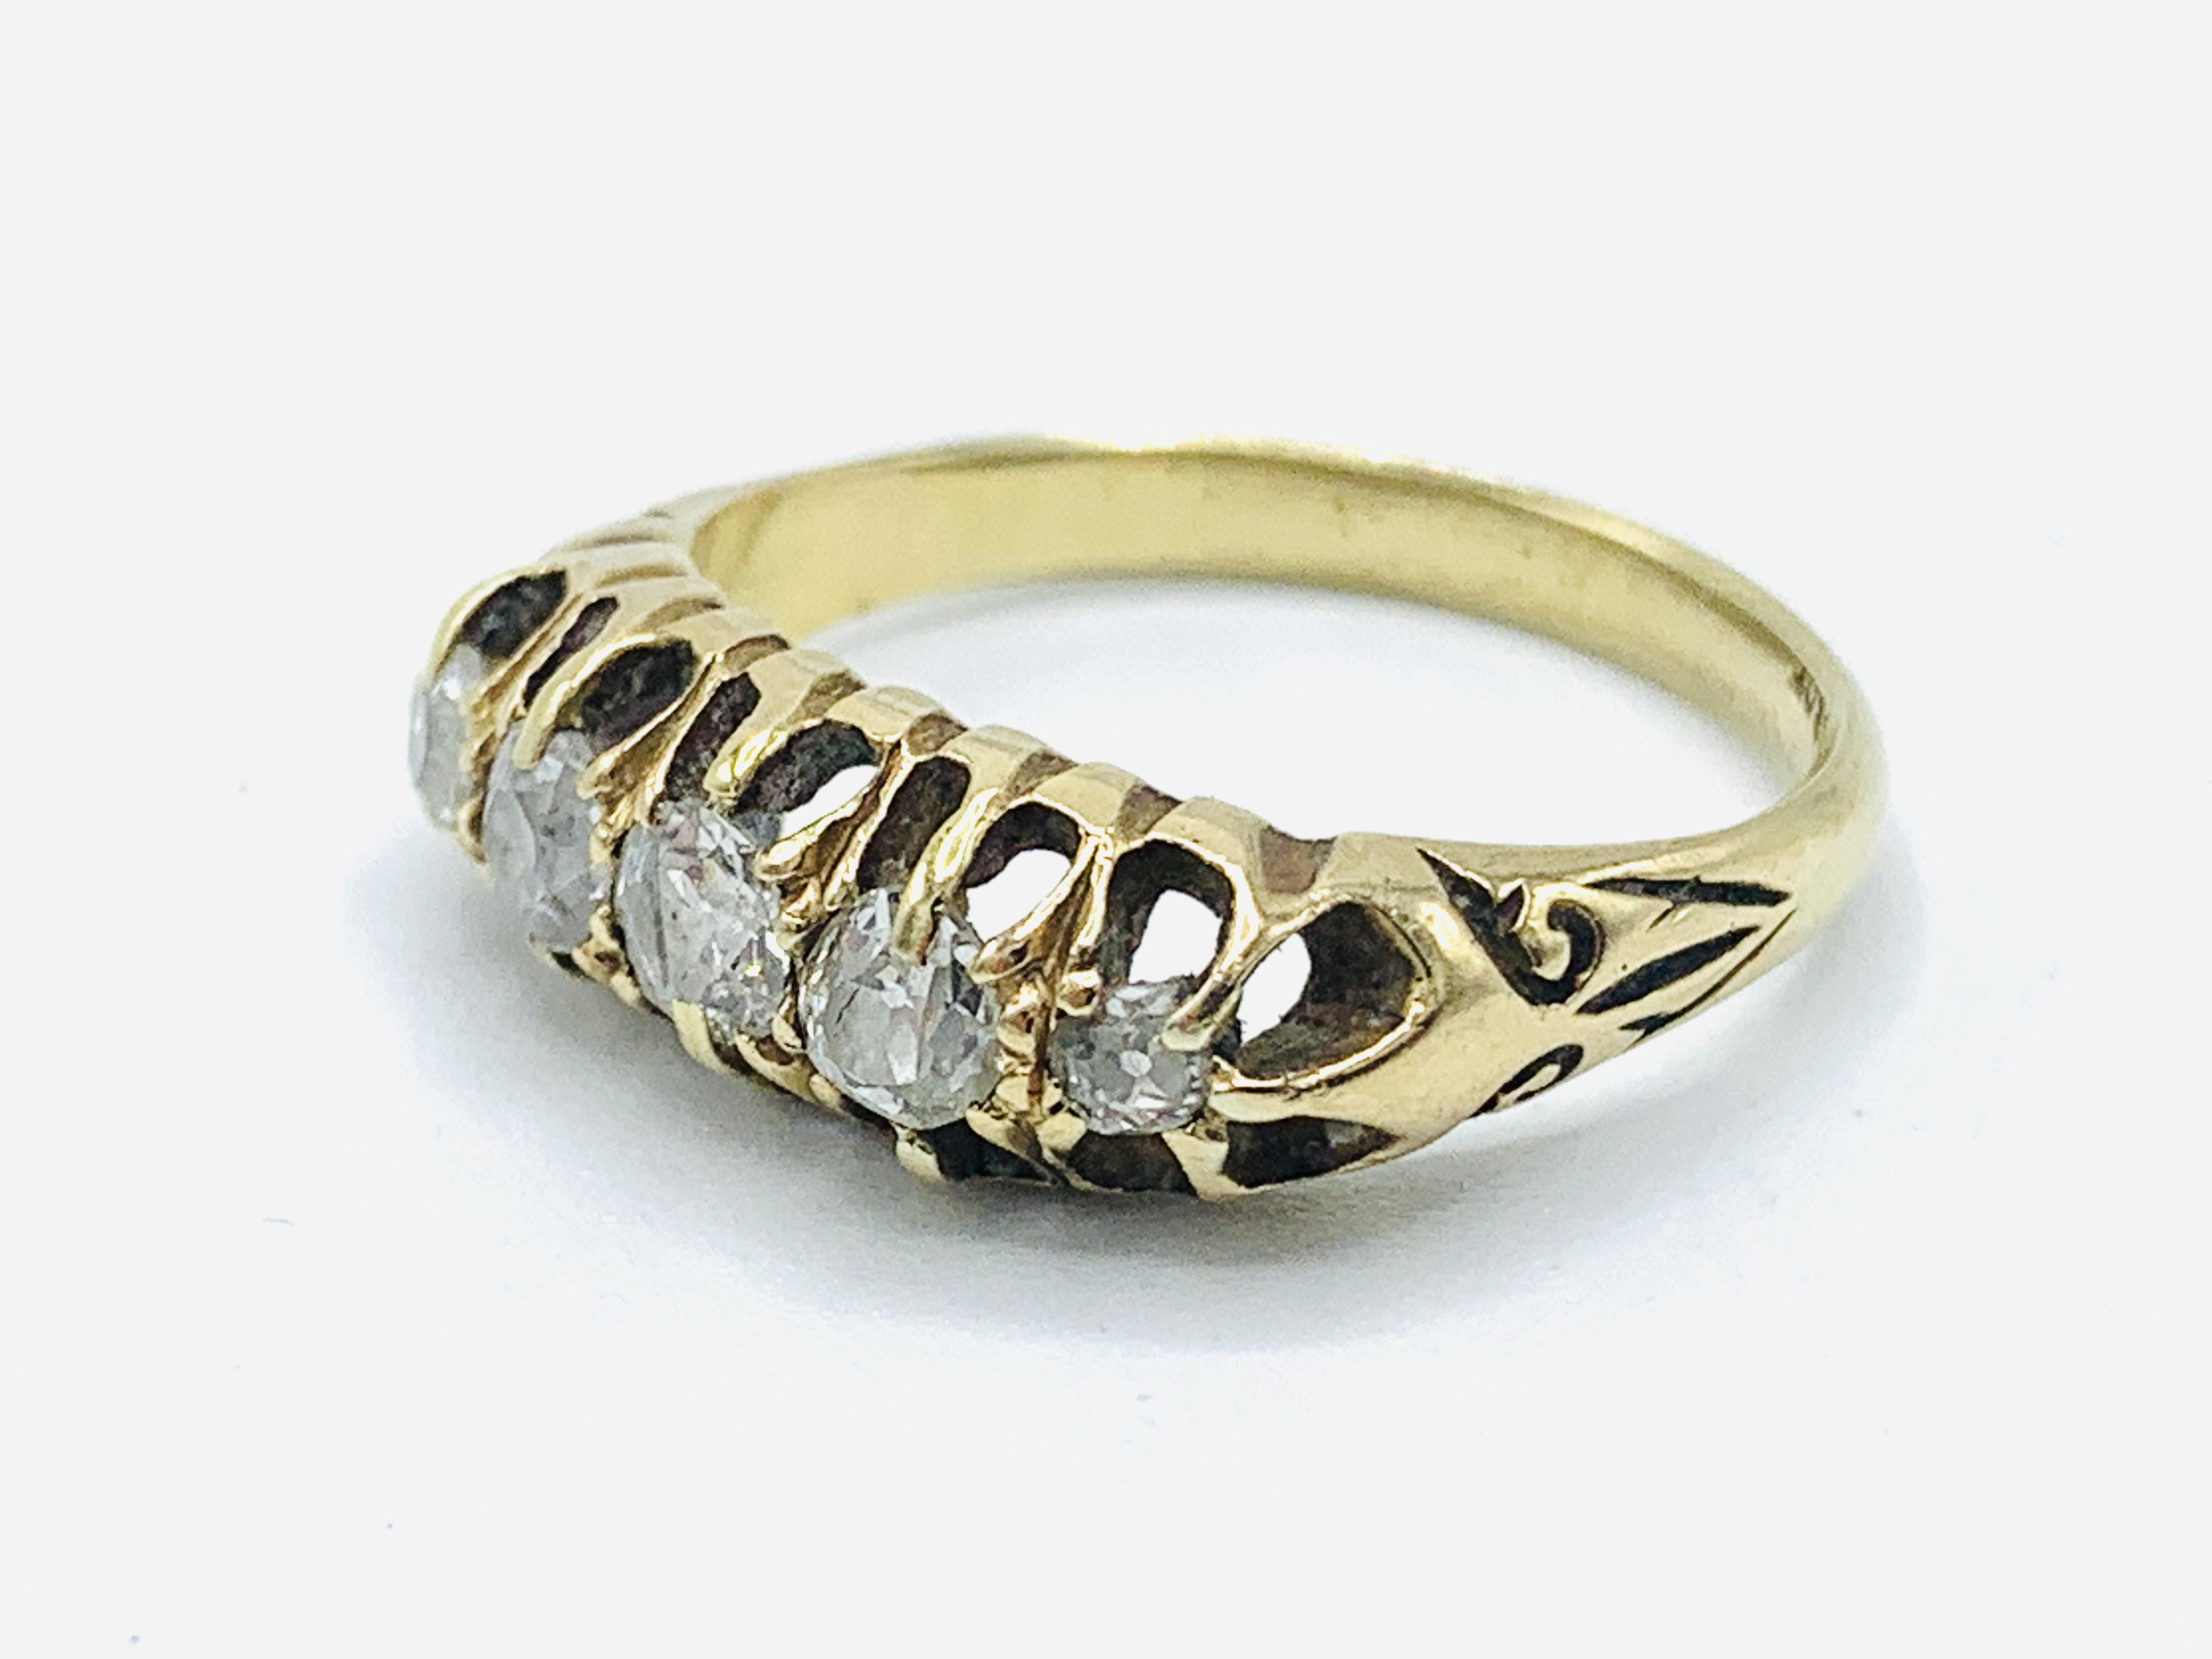 18ct gold 5 diamond ring - Image 2 of 4